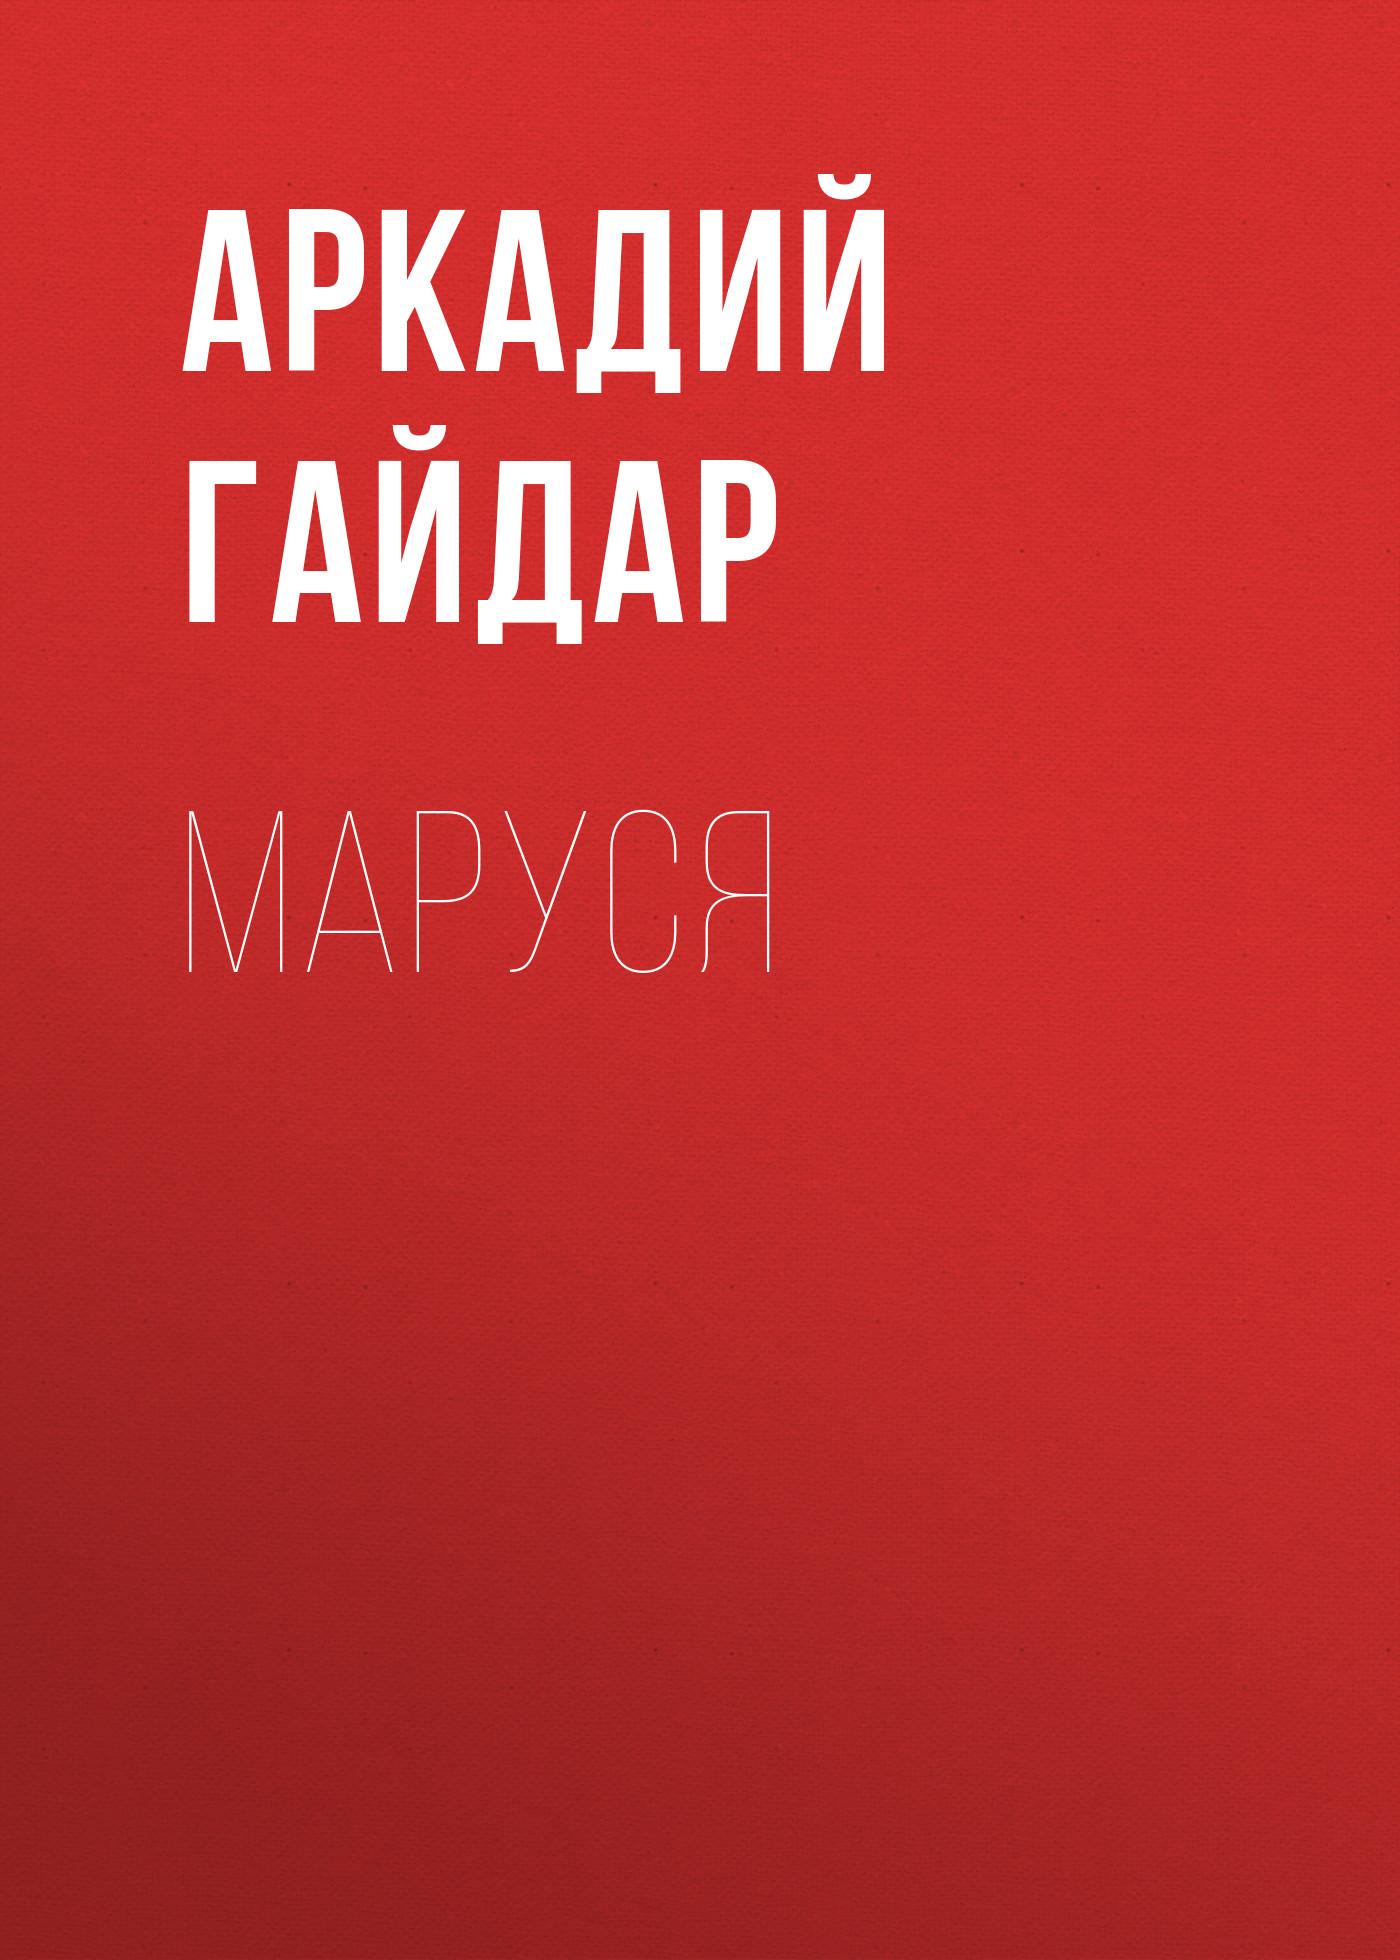 Аркадий Гайдар Маруся гайдар аркадий петрович тимур и его команда